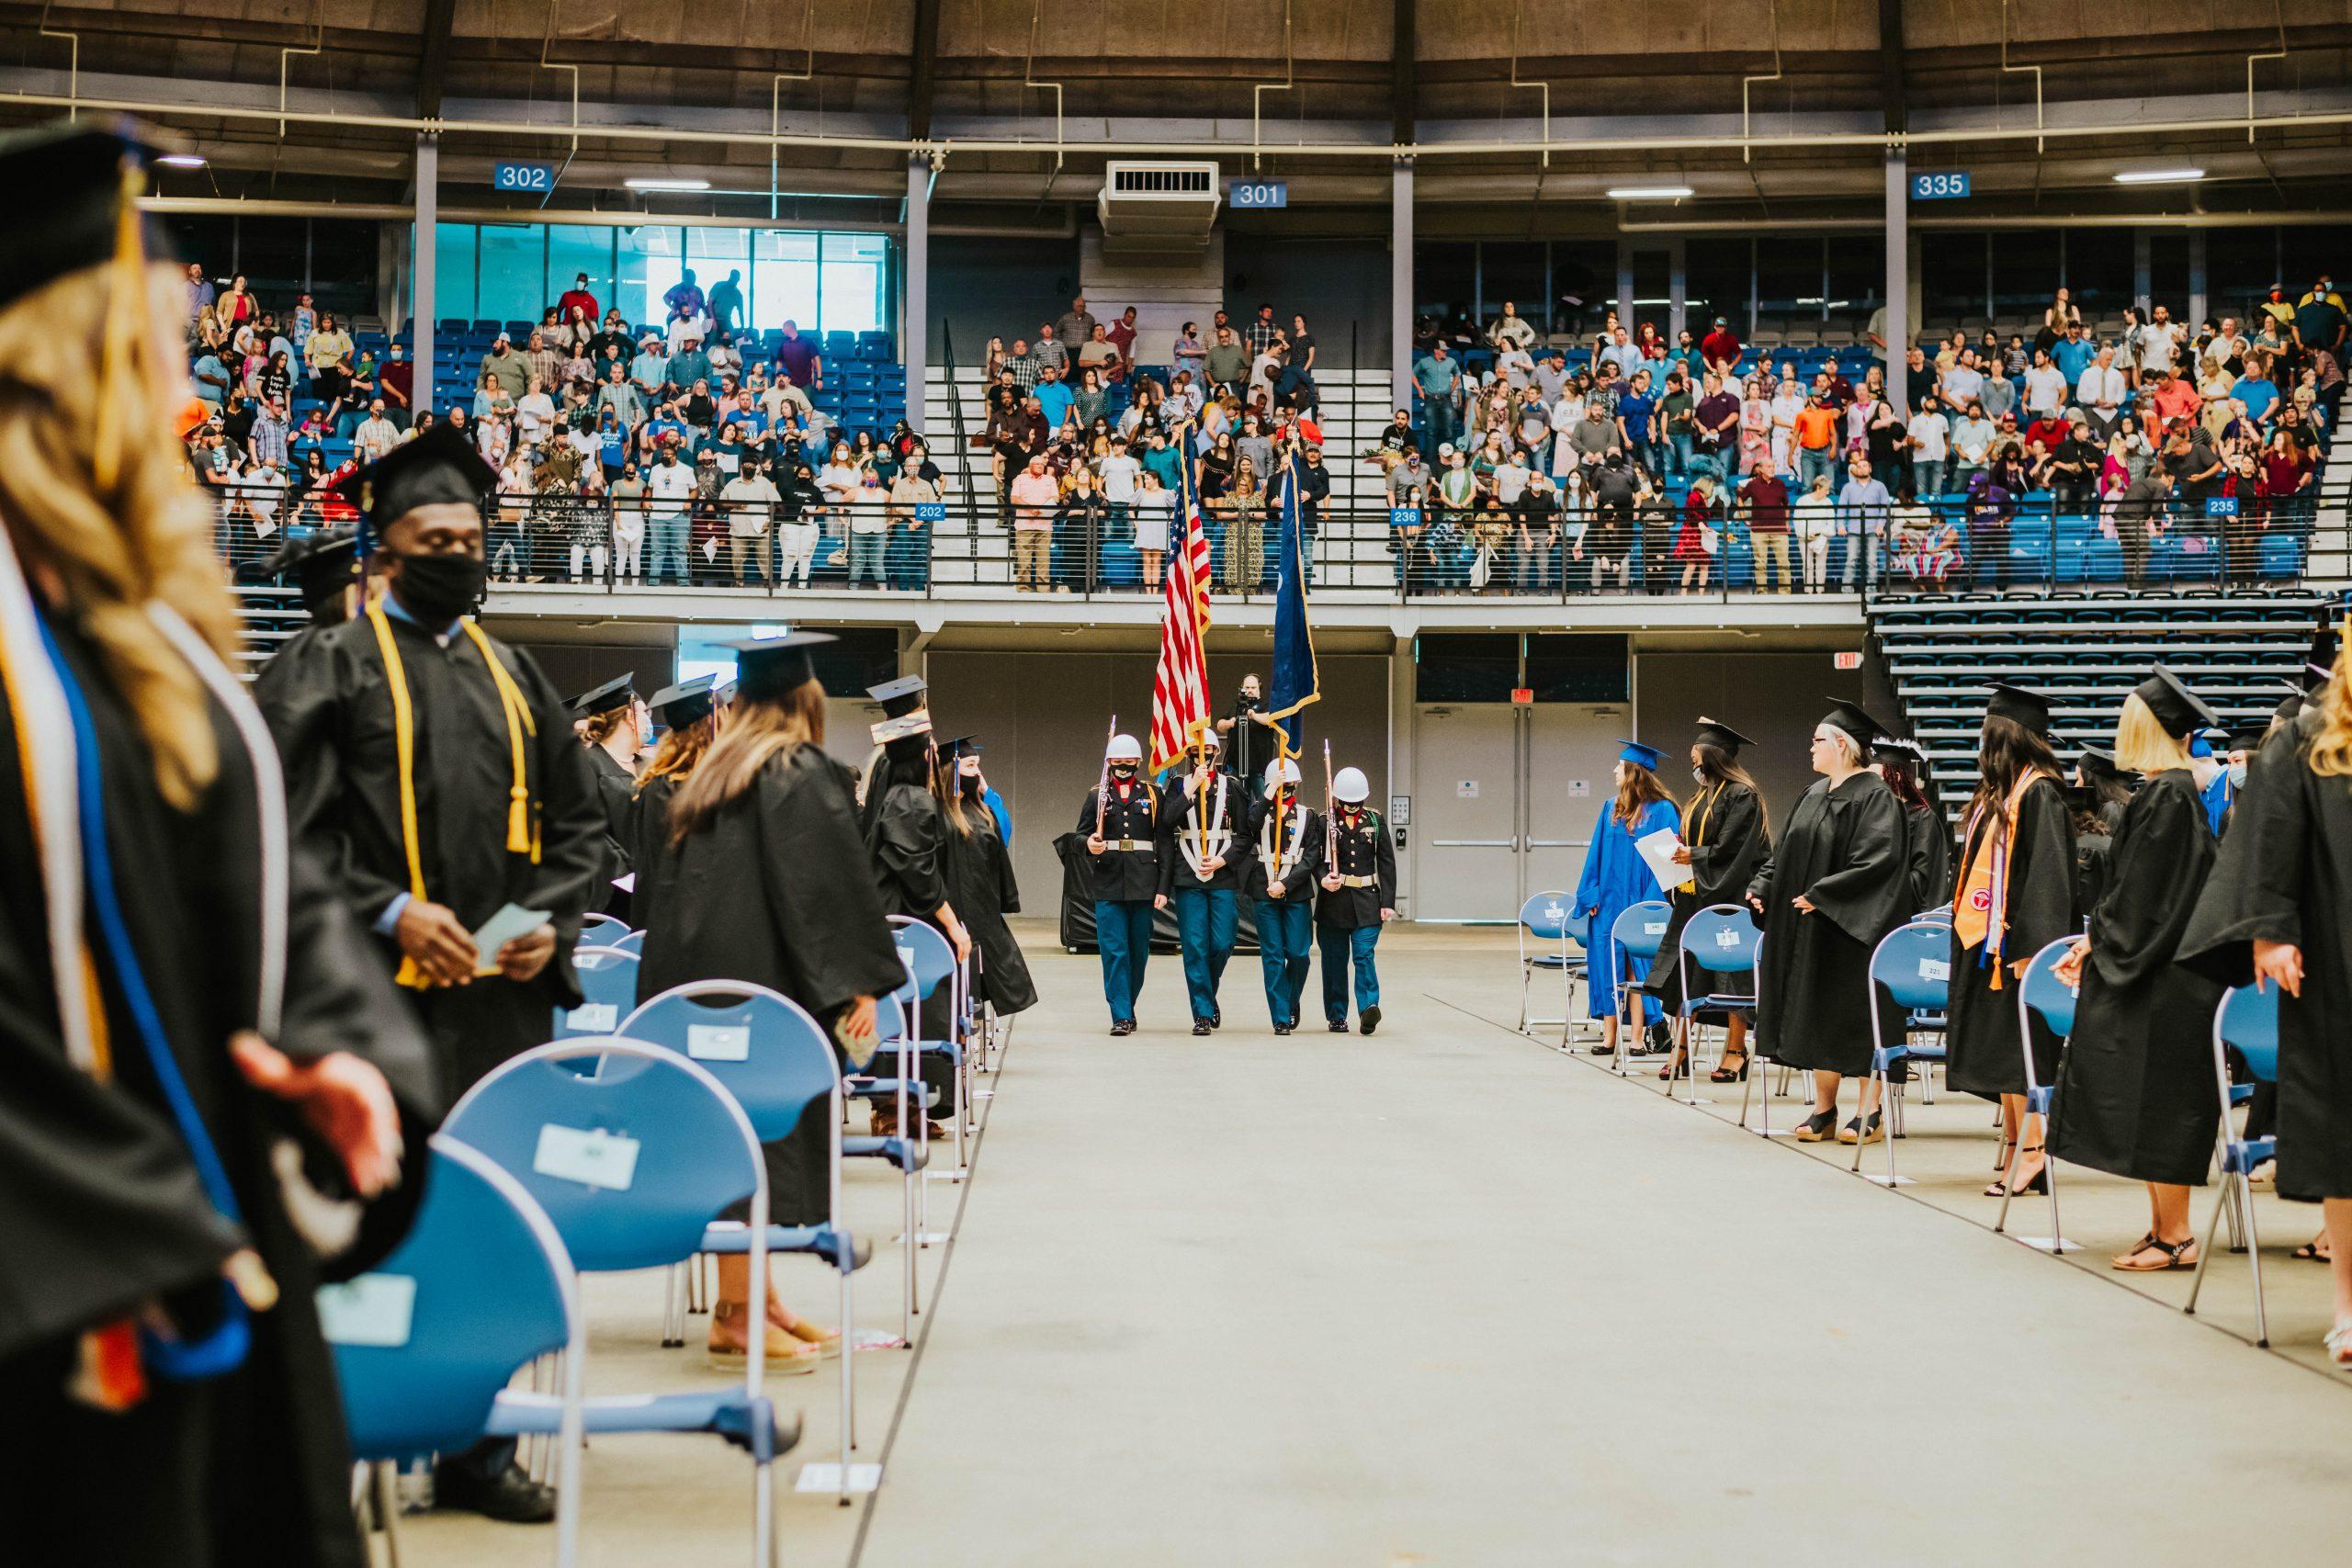 Graduation {living outside the stacks} @DaenelT